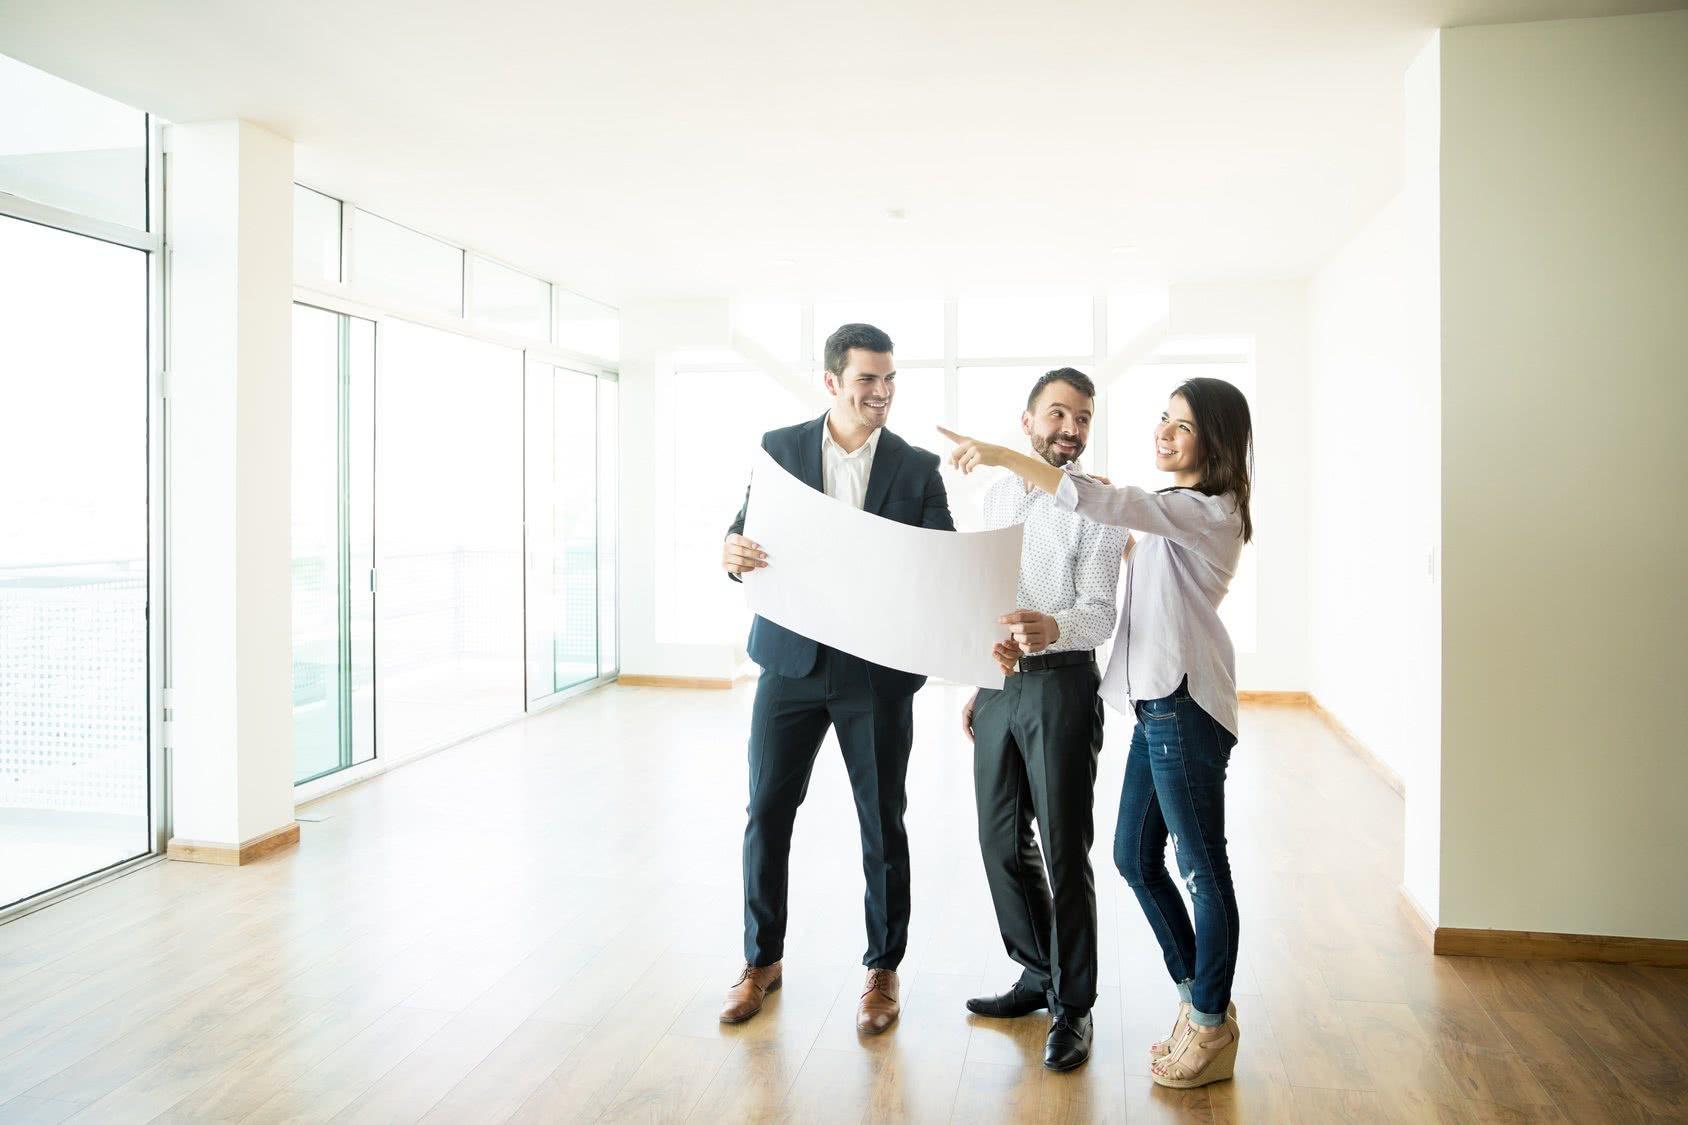 Wohnungsbewerbung